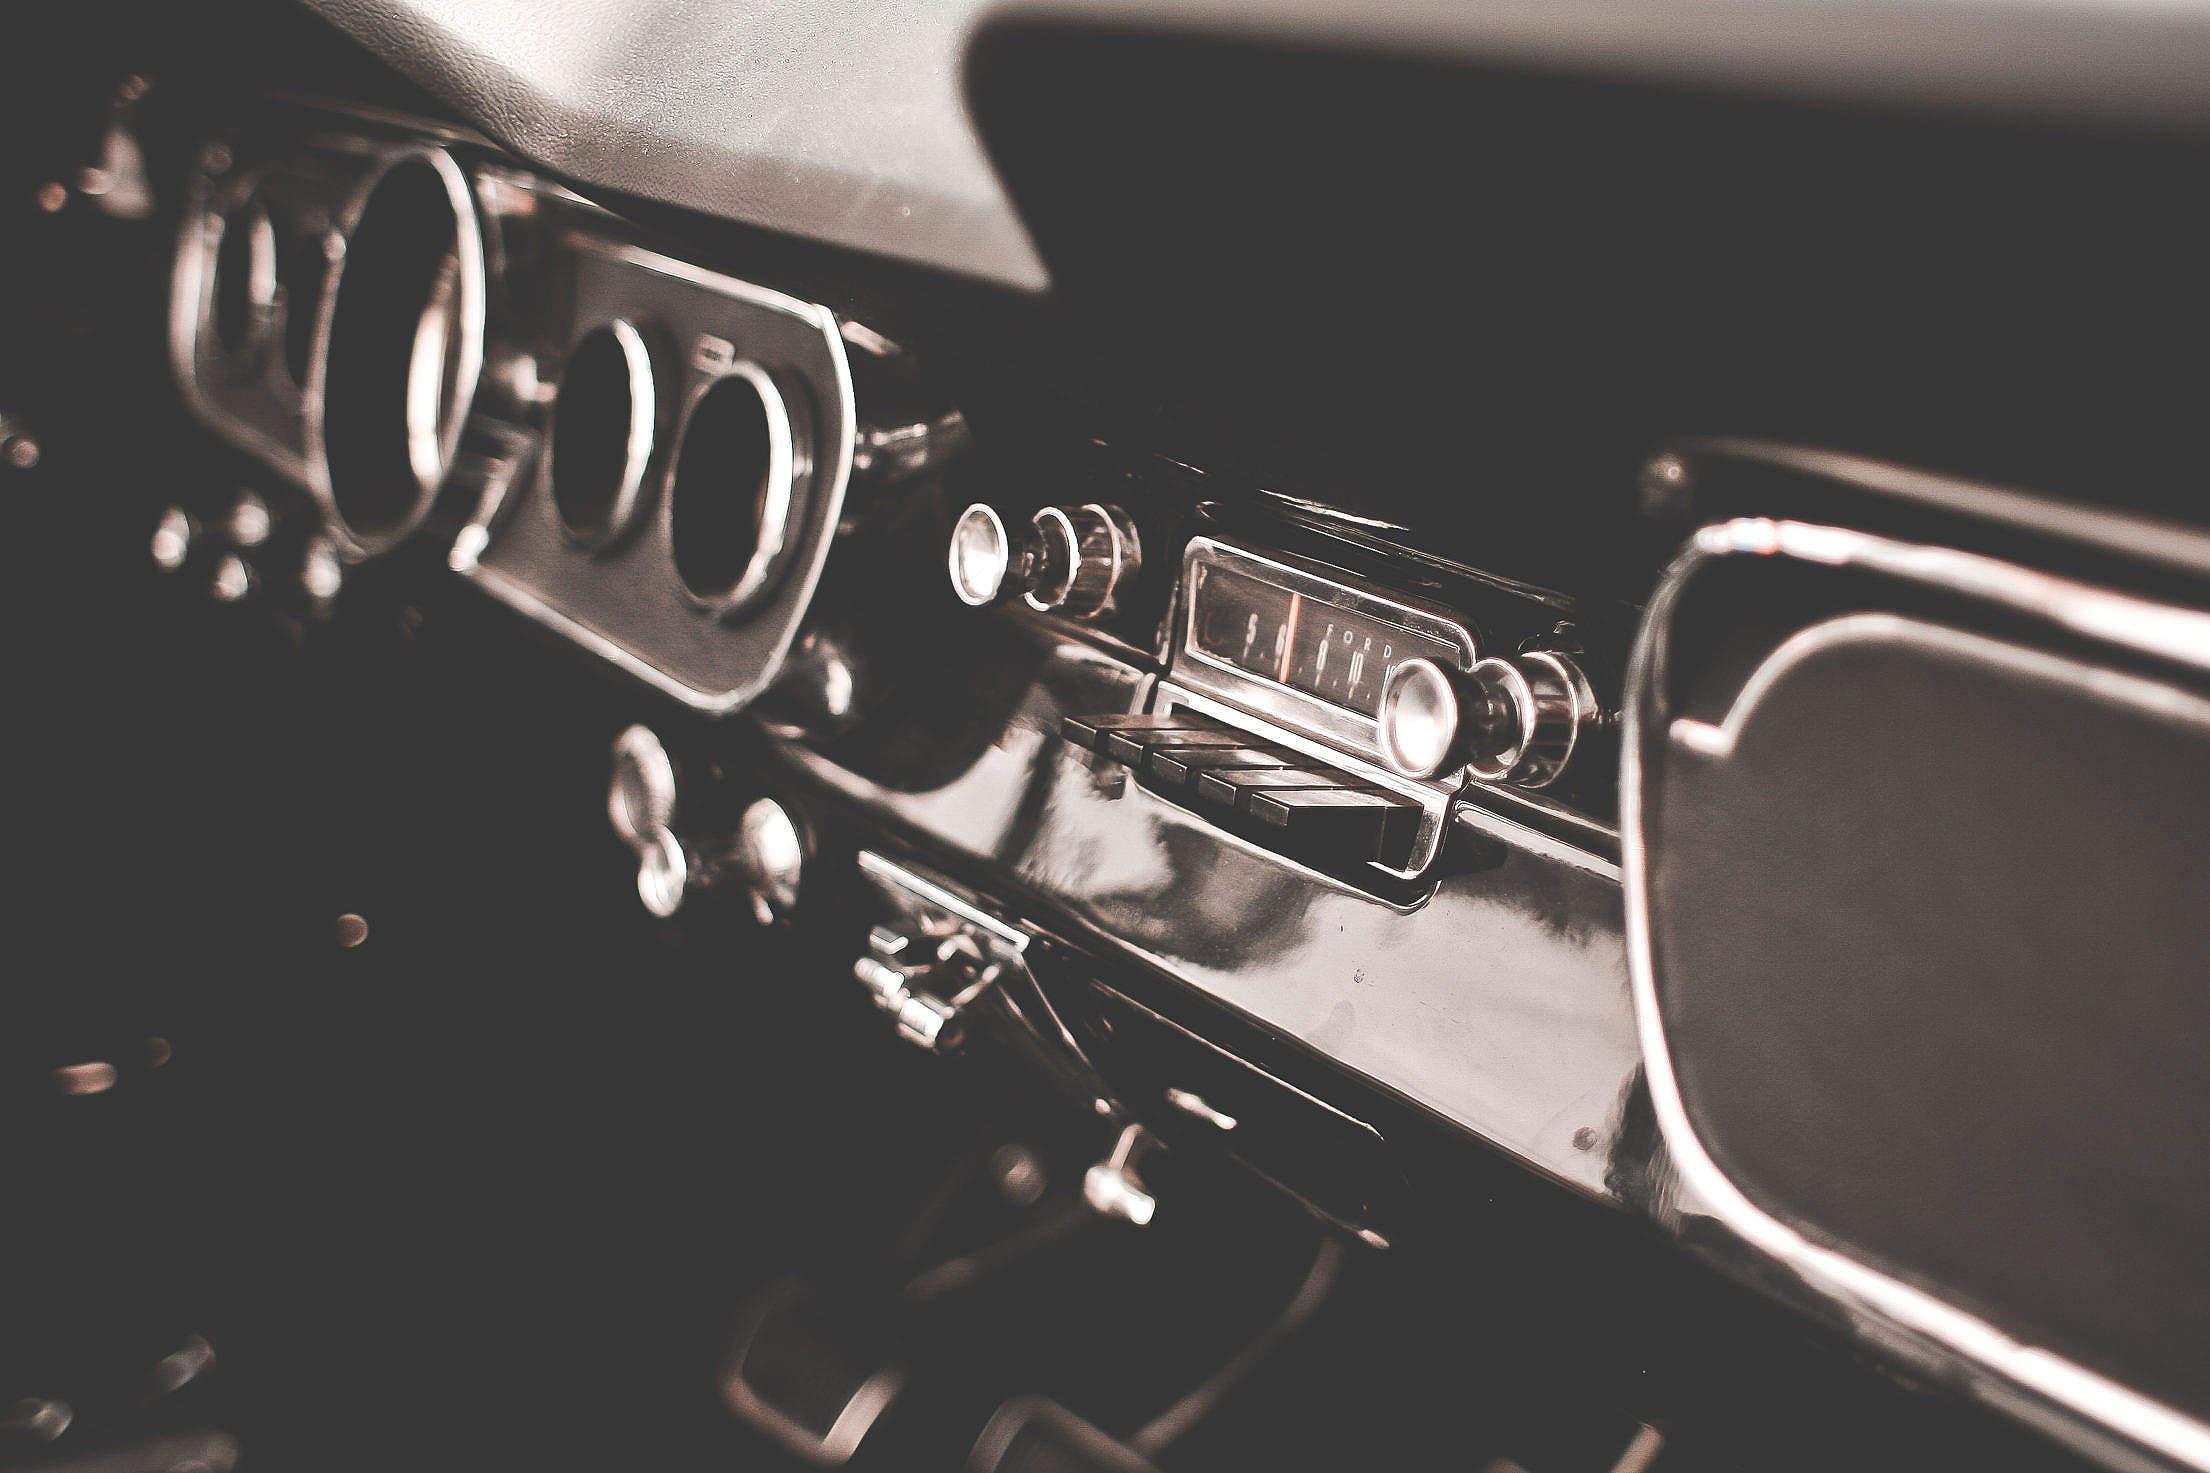 Retro Dashboard in Veteran Car Free Stock Photo